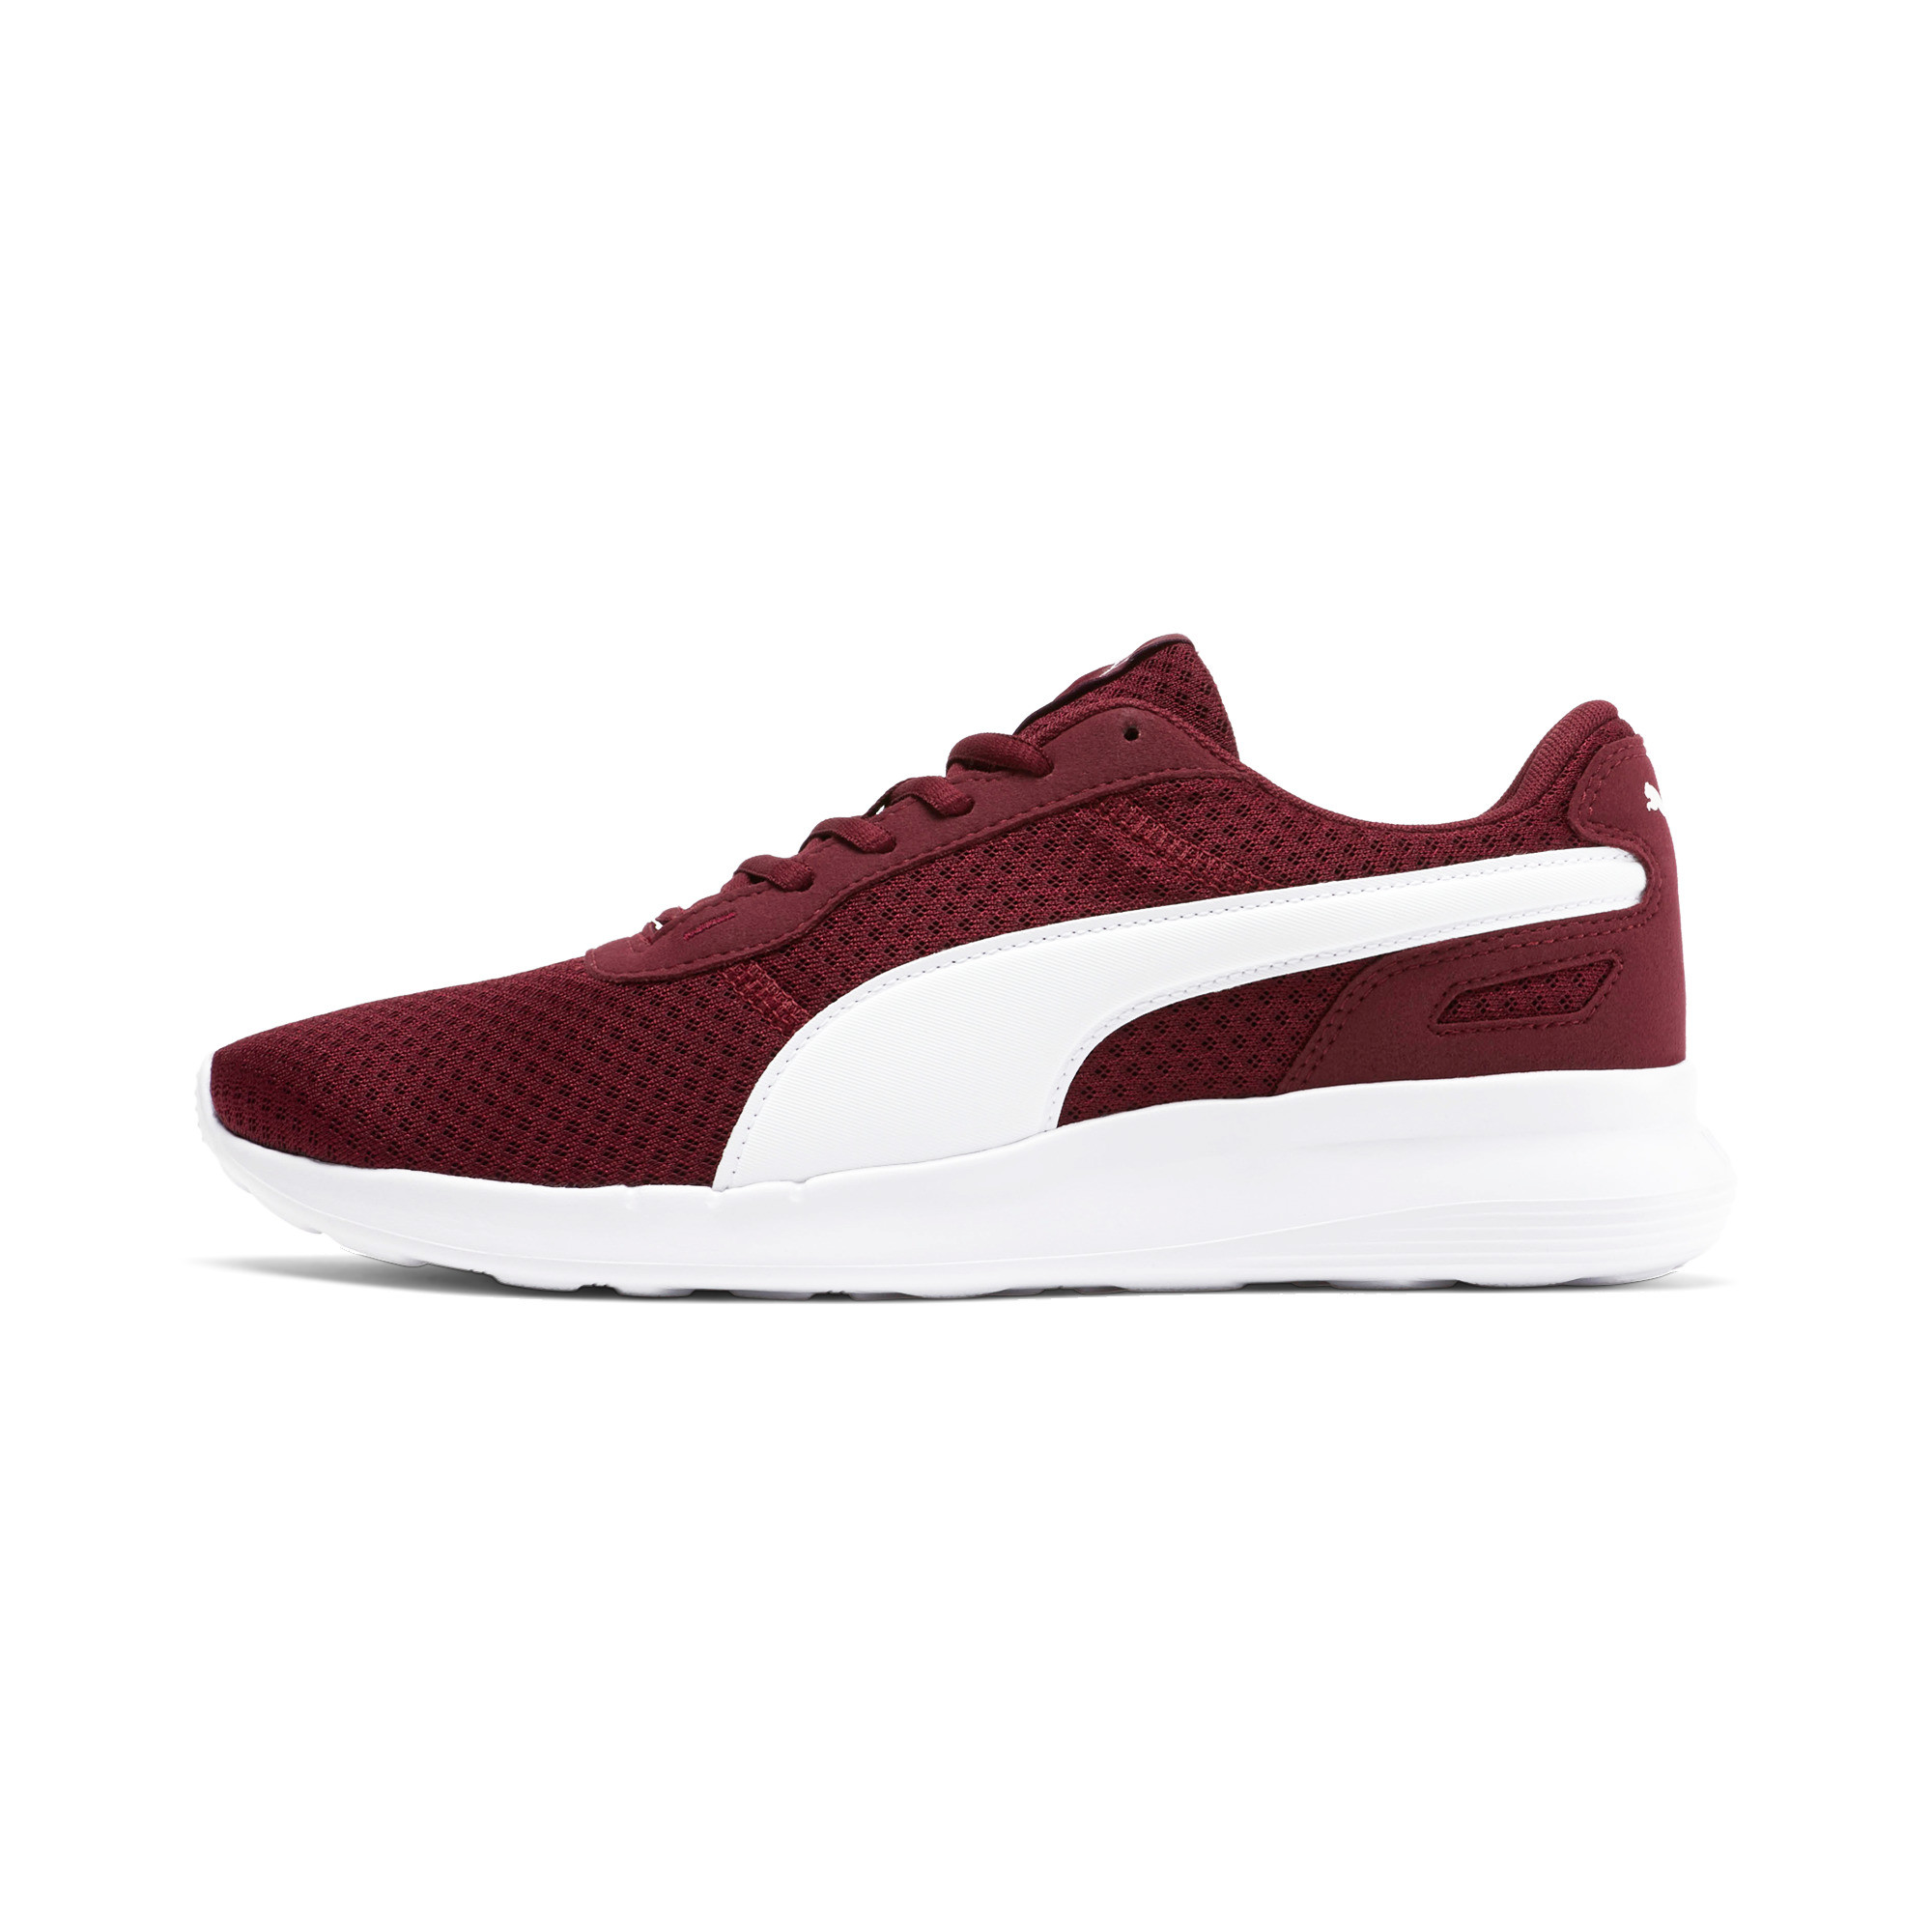 PUMA-Men-039-s-ST-Activate-Sneakers thumbnail 14